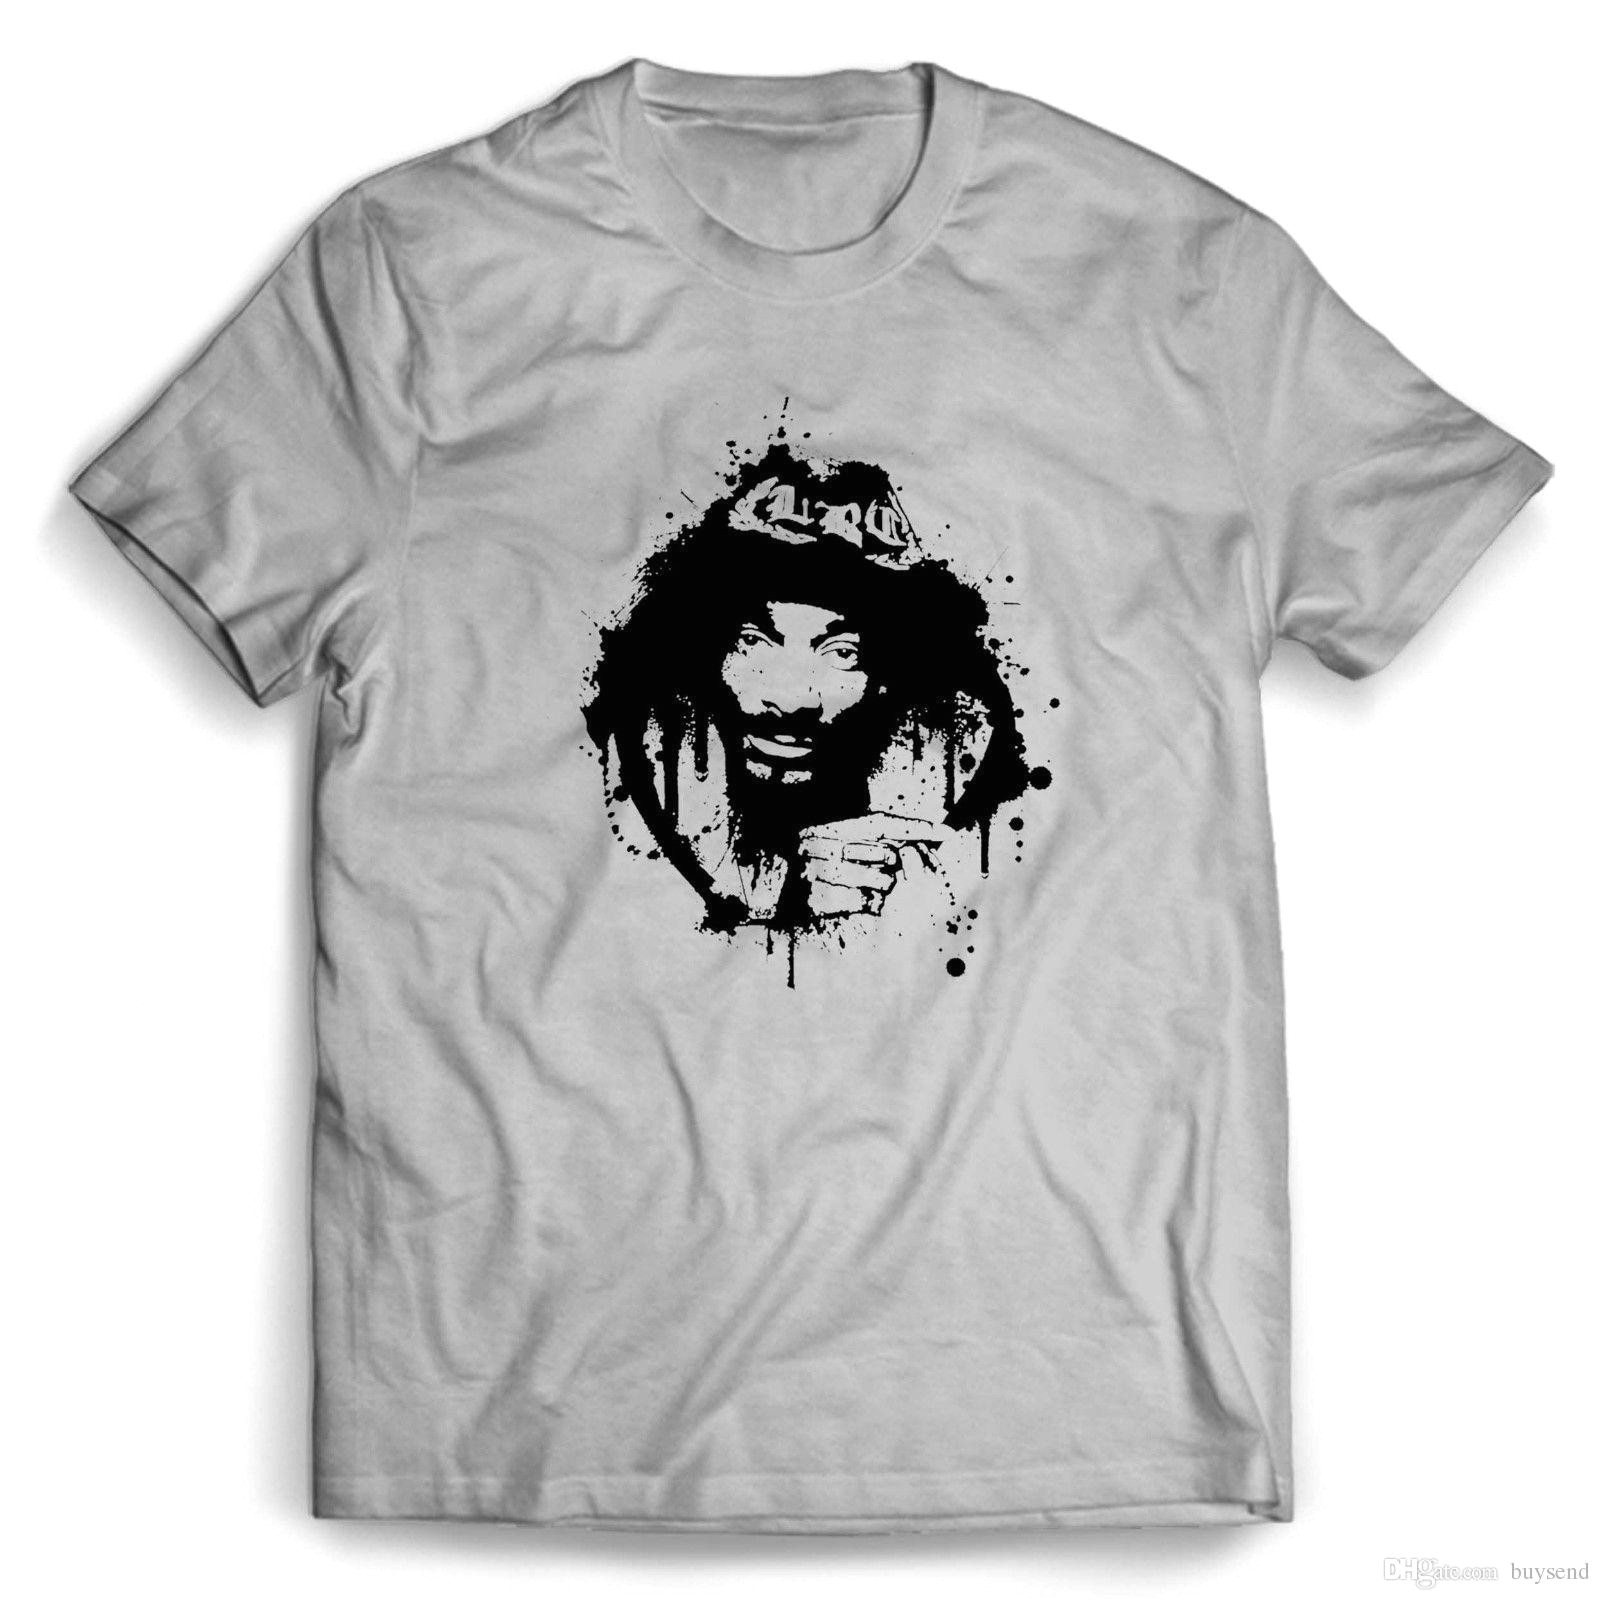 snoop dogg art drawing man woman t shirt hilarious t shirts designer t shirt from buysend 10 03 dhgate com